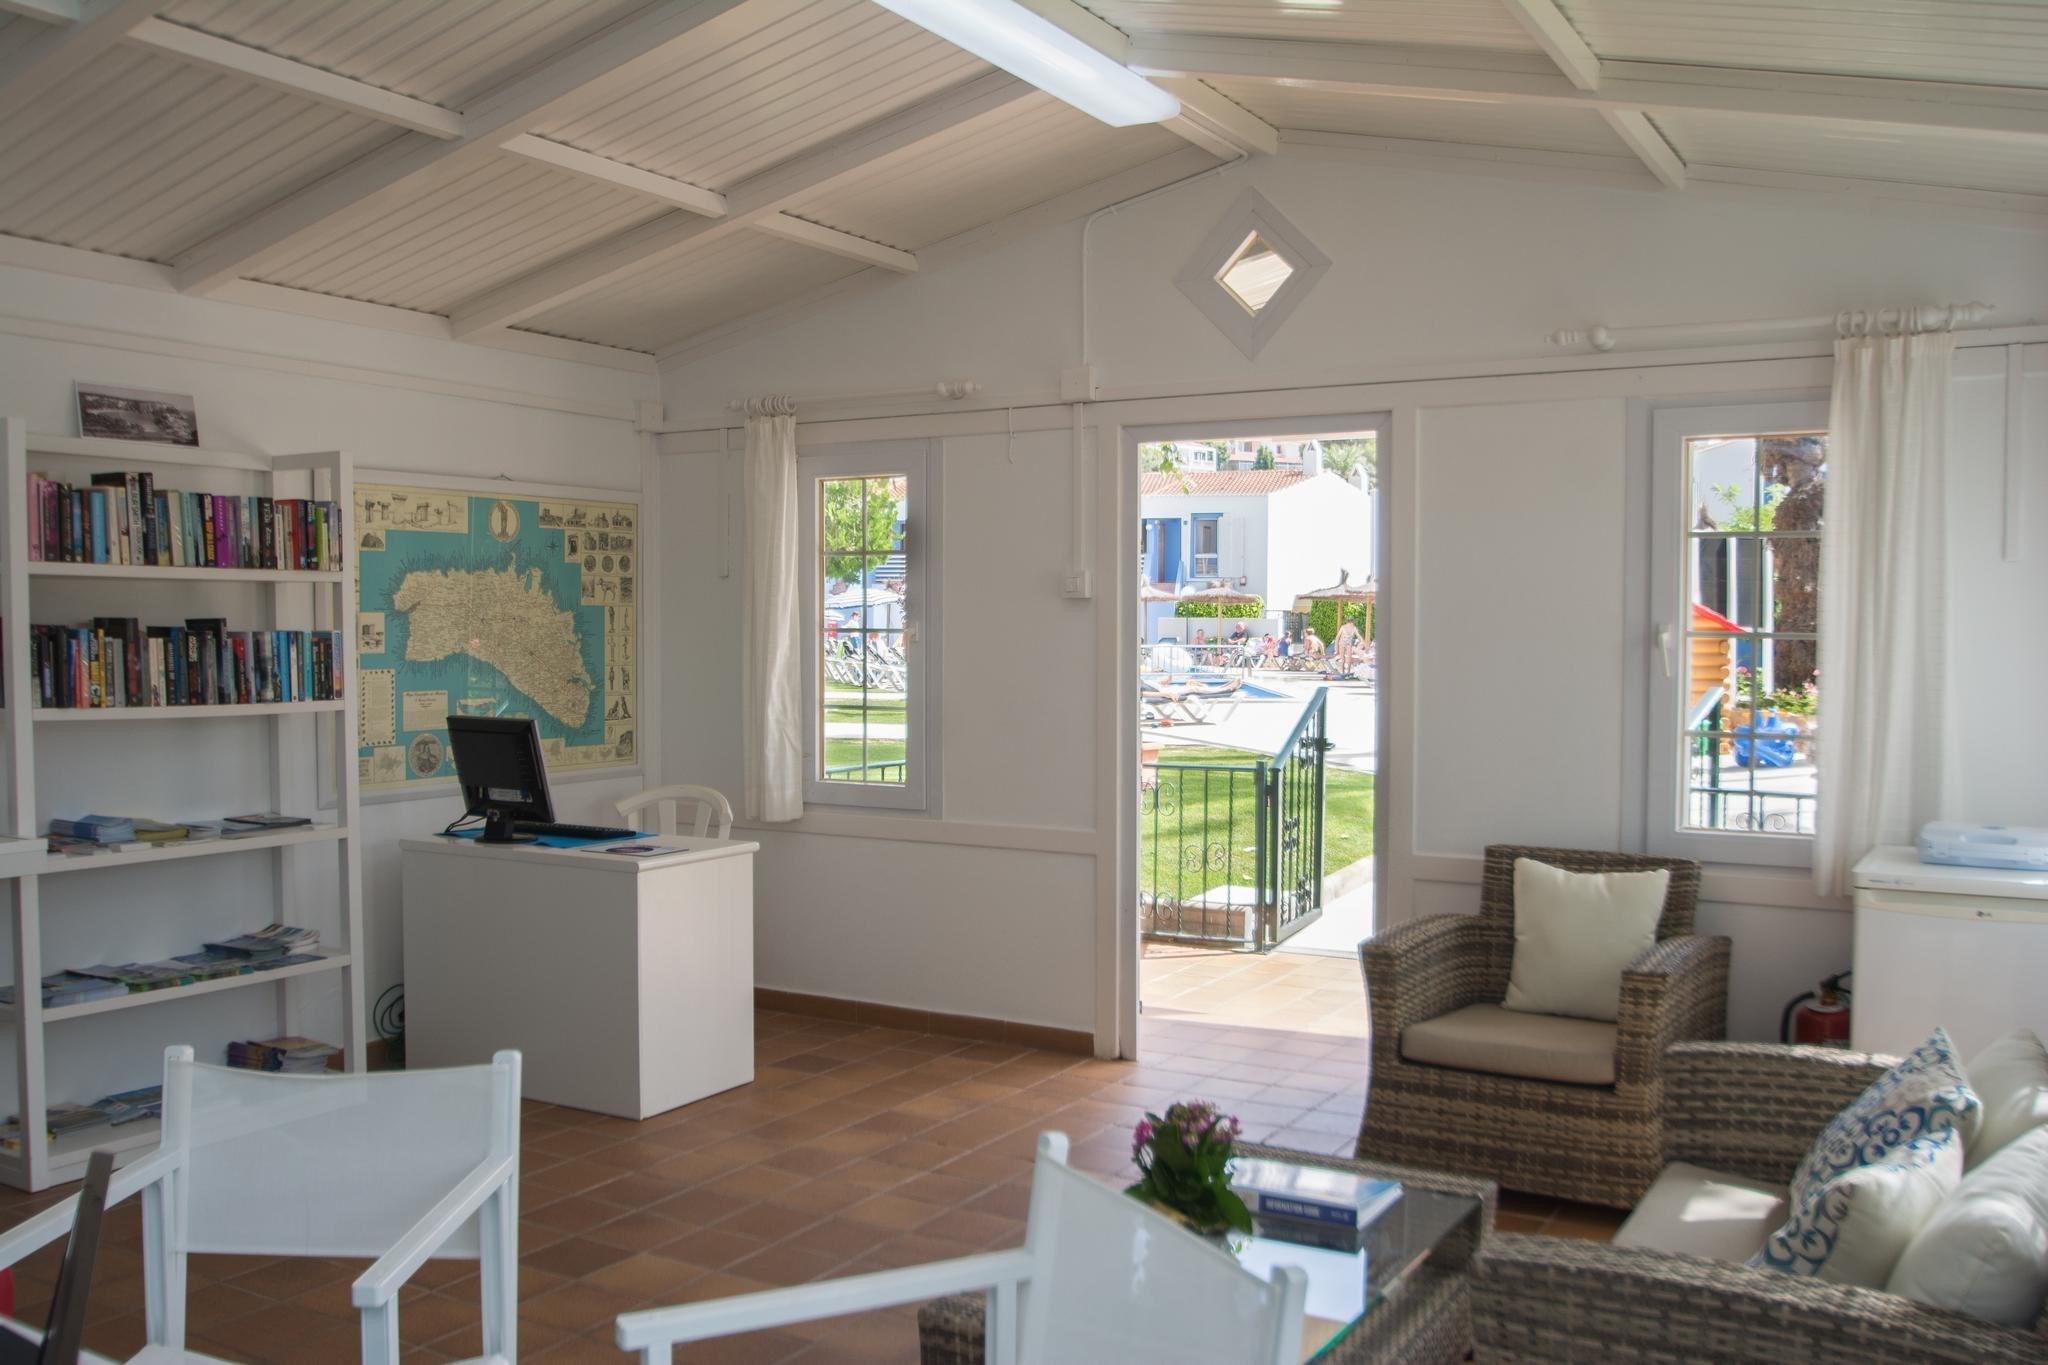 Resort Galdana Gardens Menorca: apartments with swimming pool and